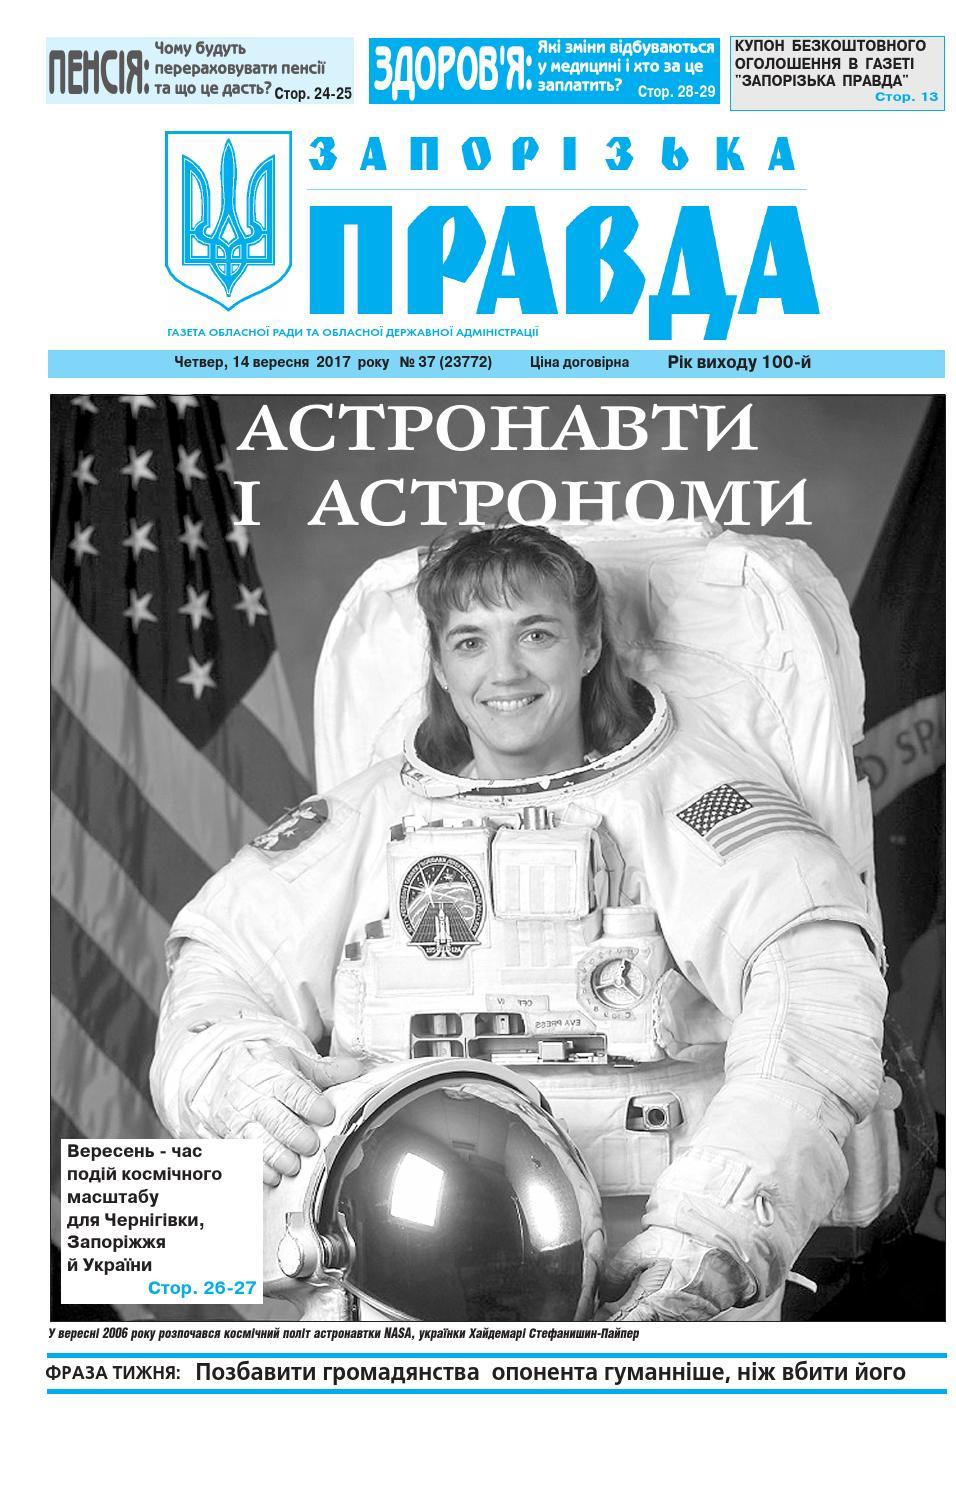 9a3ac38e514461 14 09 17 by Запорізька правда - issuu